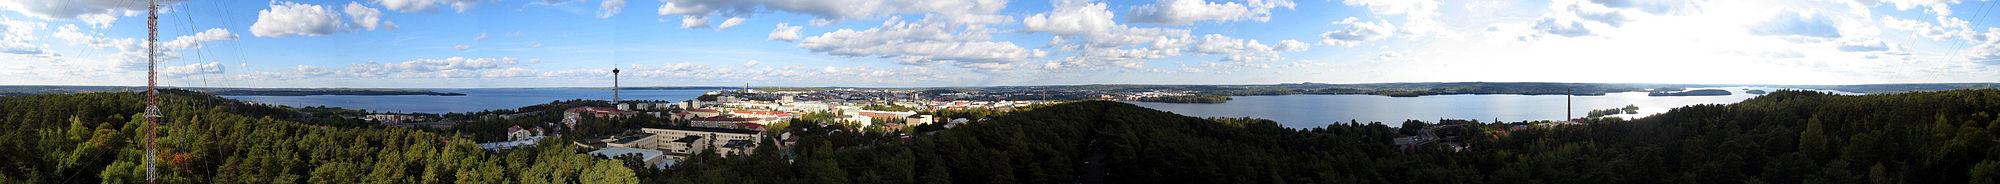 Panorama Tampere z věže v Pyynikki